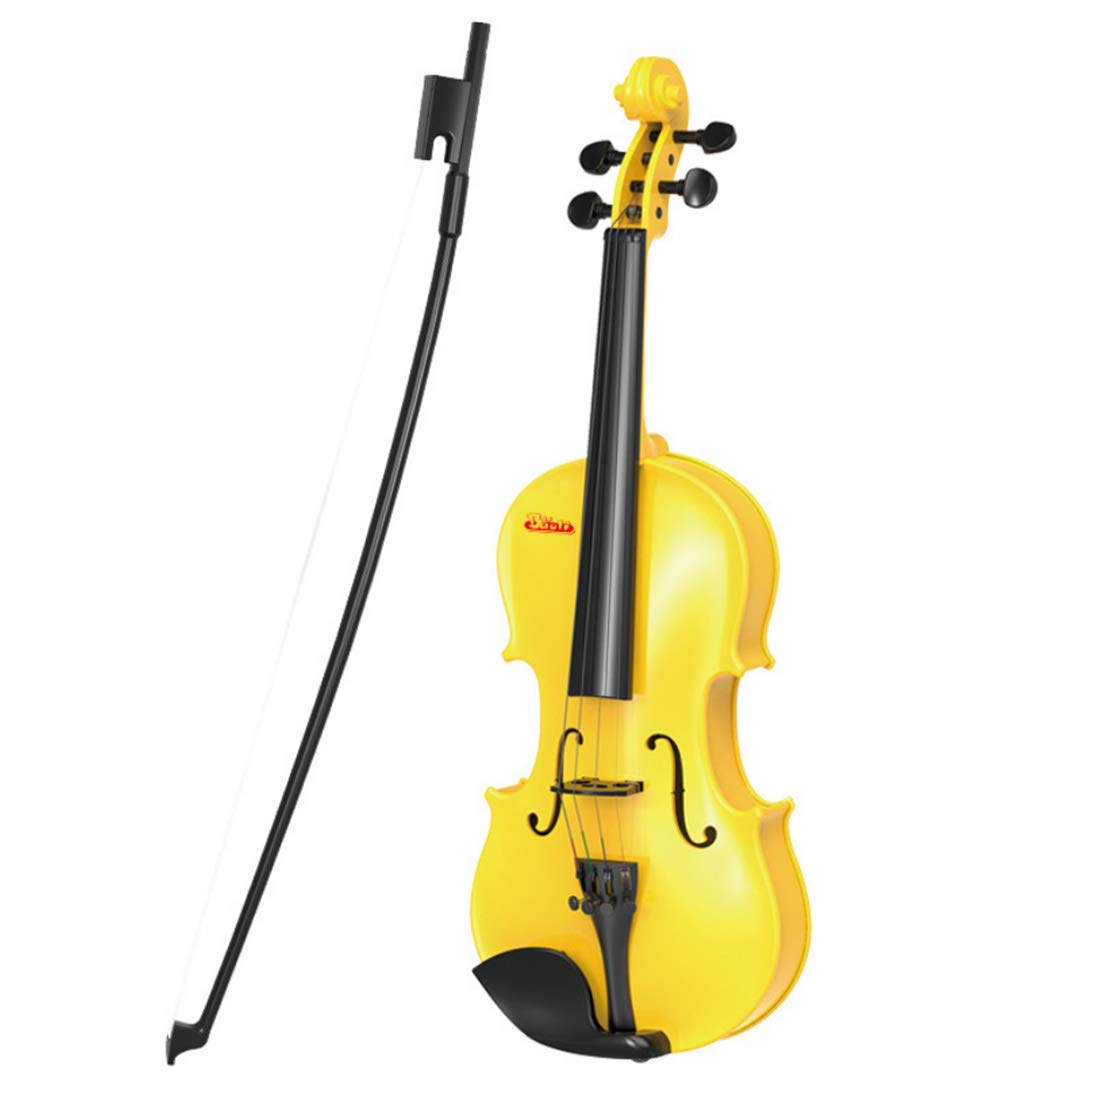 RuiyiF Toy Violin for Kids Beginners Ages 5-9, Play Violin for Kids Musical Toys for Toddlers 18 Inch(Yellow) by RuiyiF